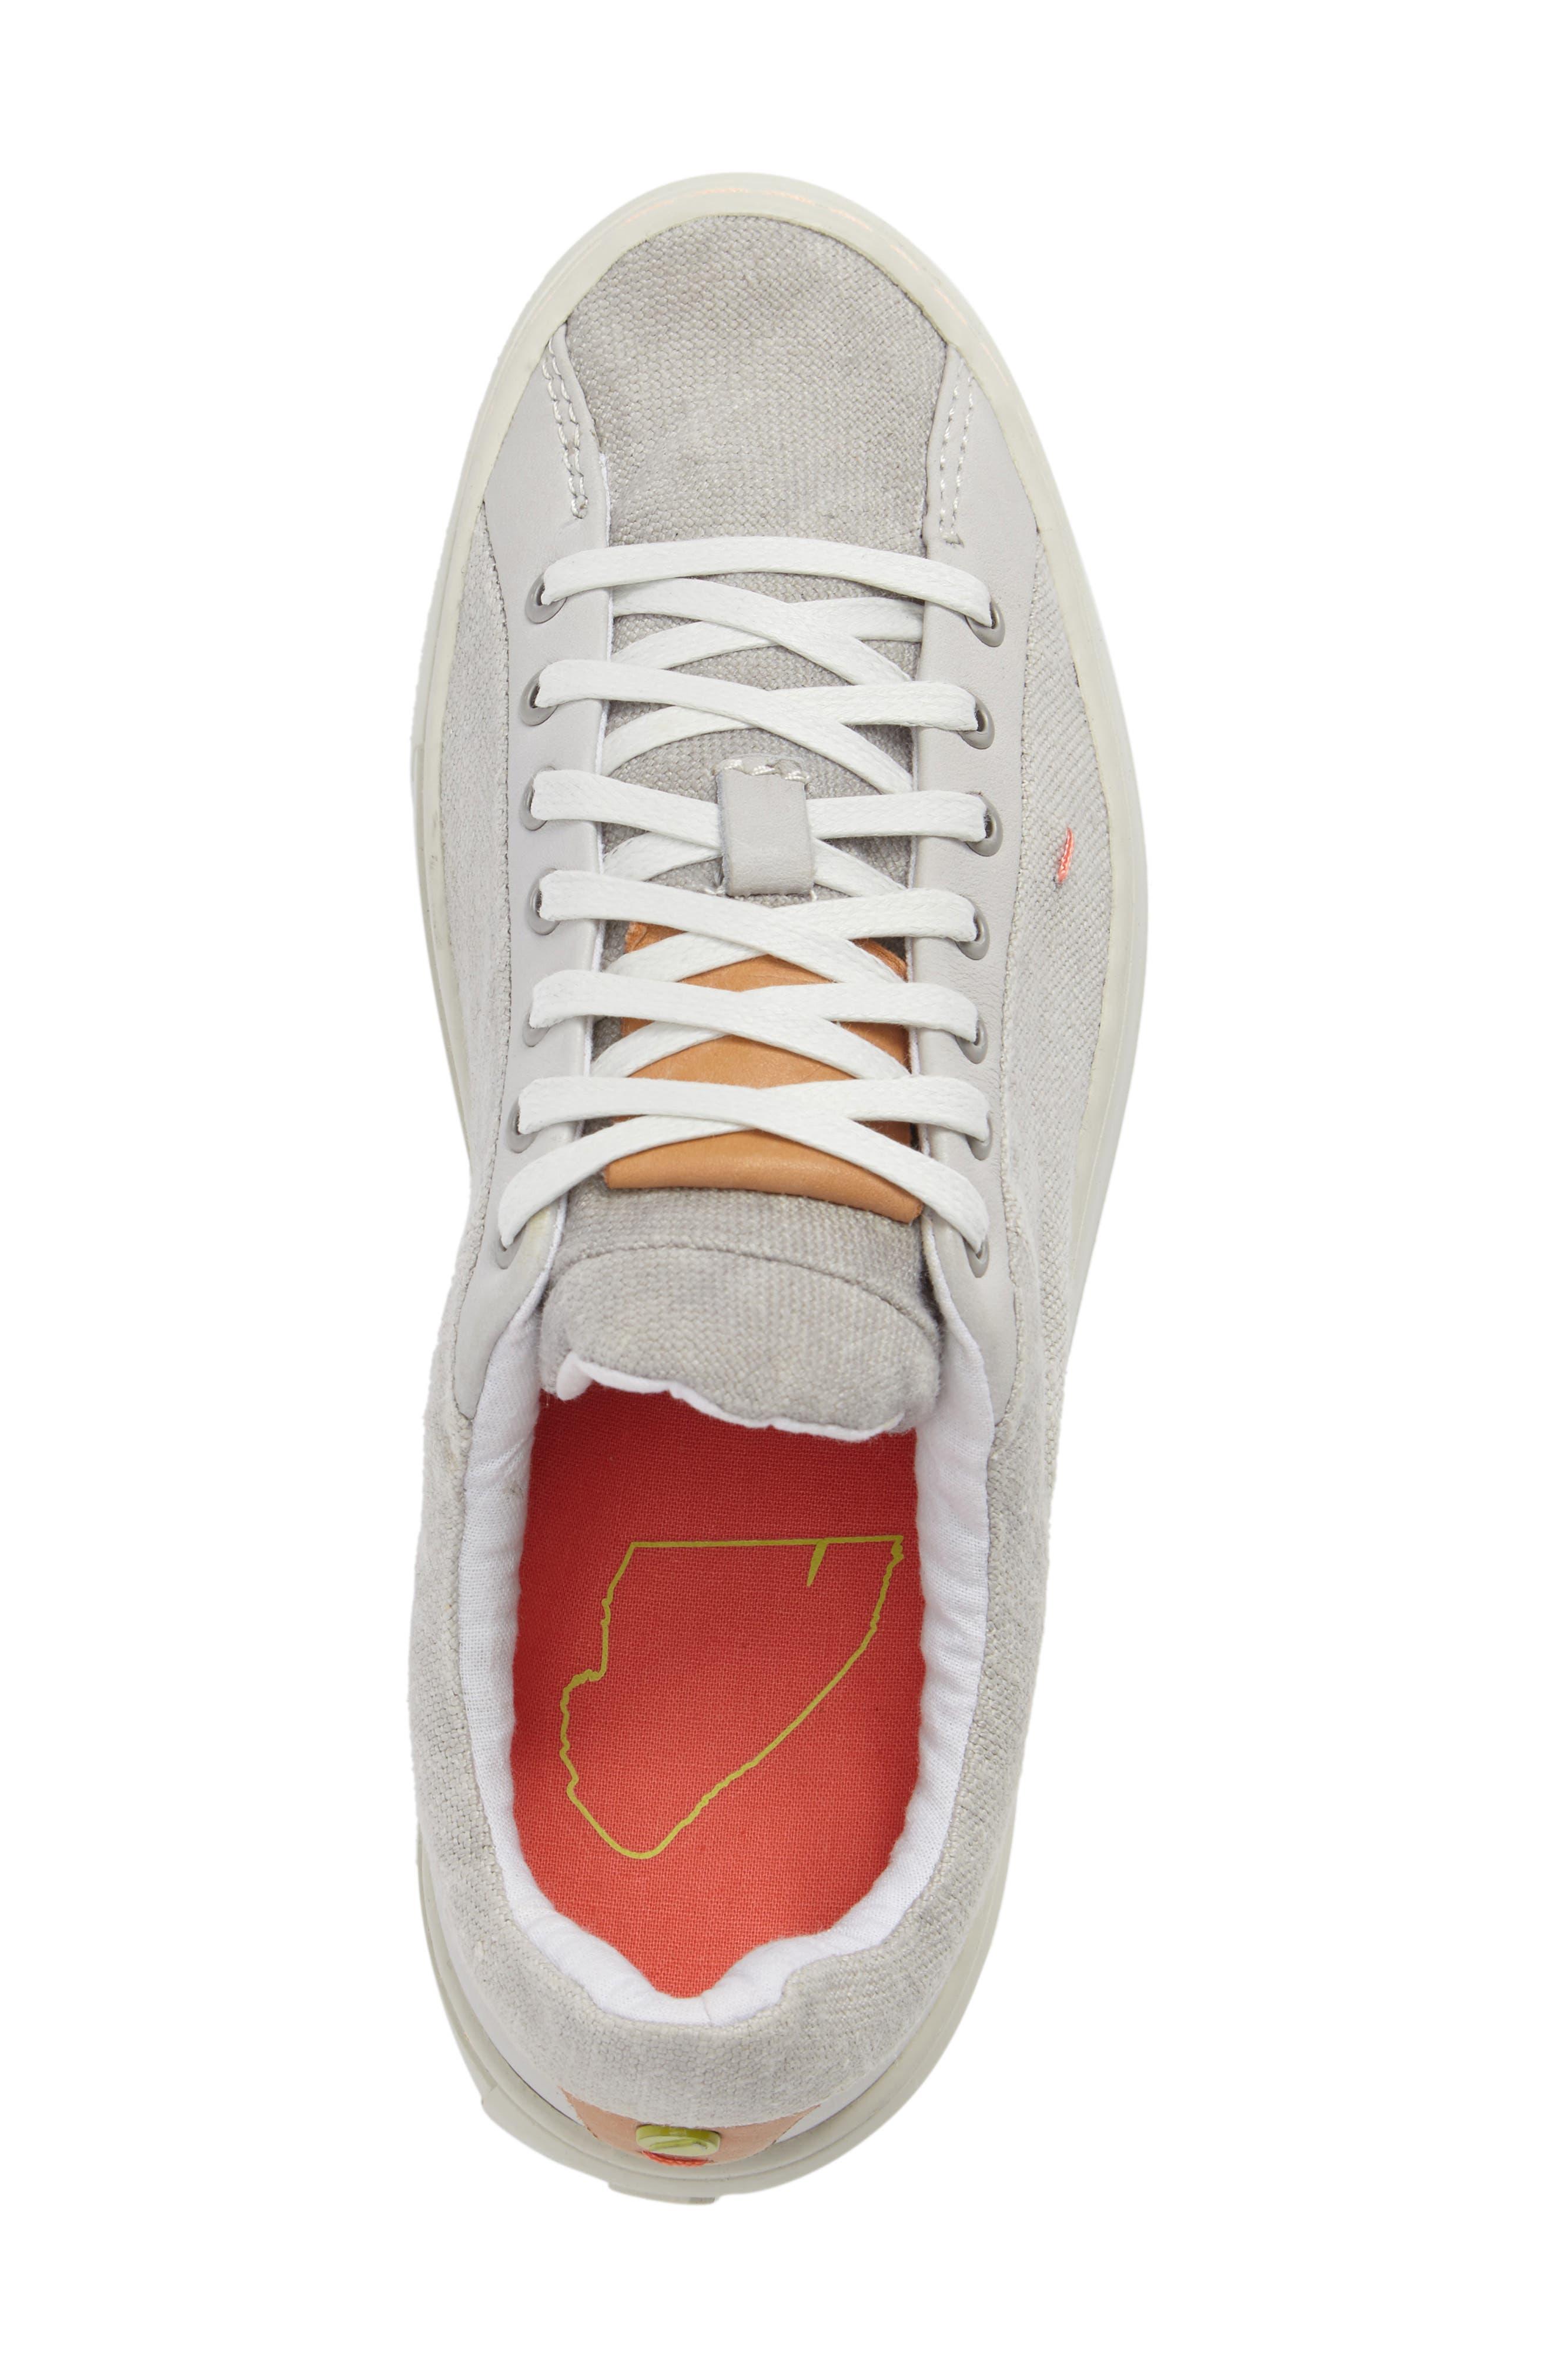 Somerville Sneaker,                             Alternate thumbnail 5, color,                             CONCRETE FABRIC